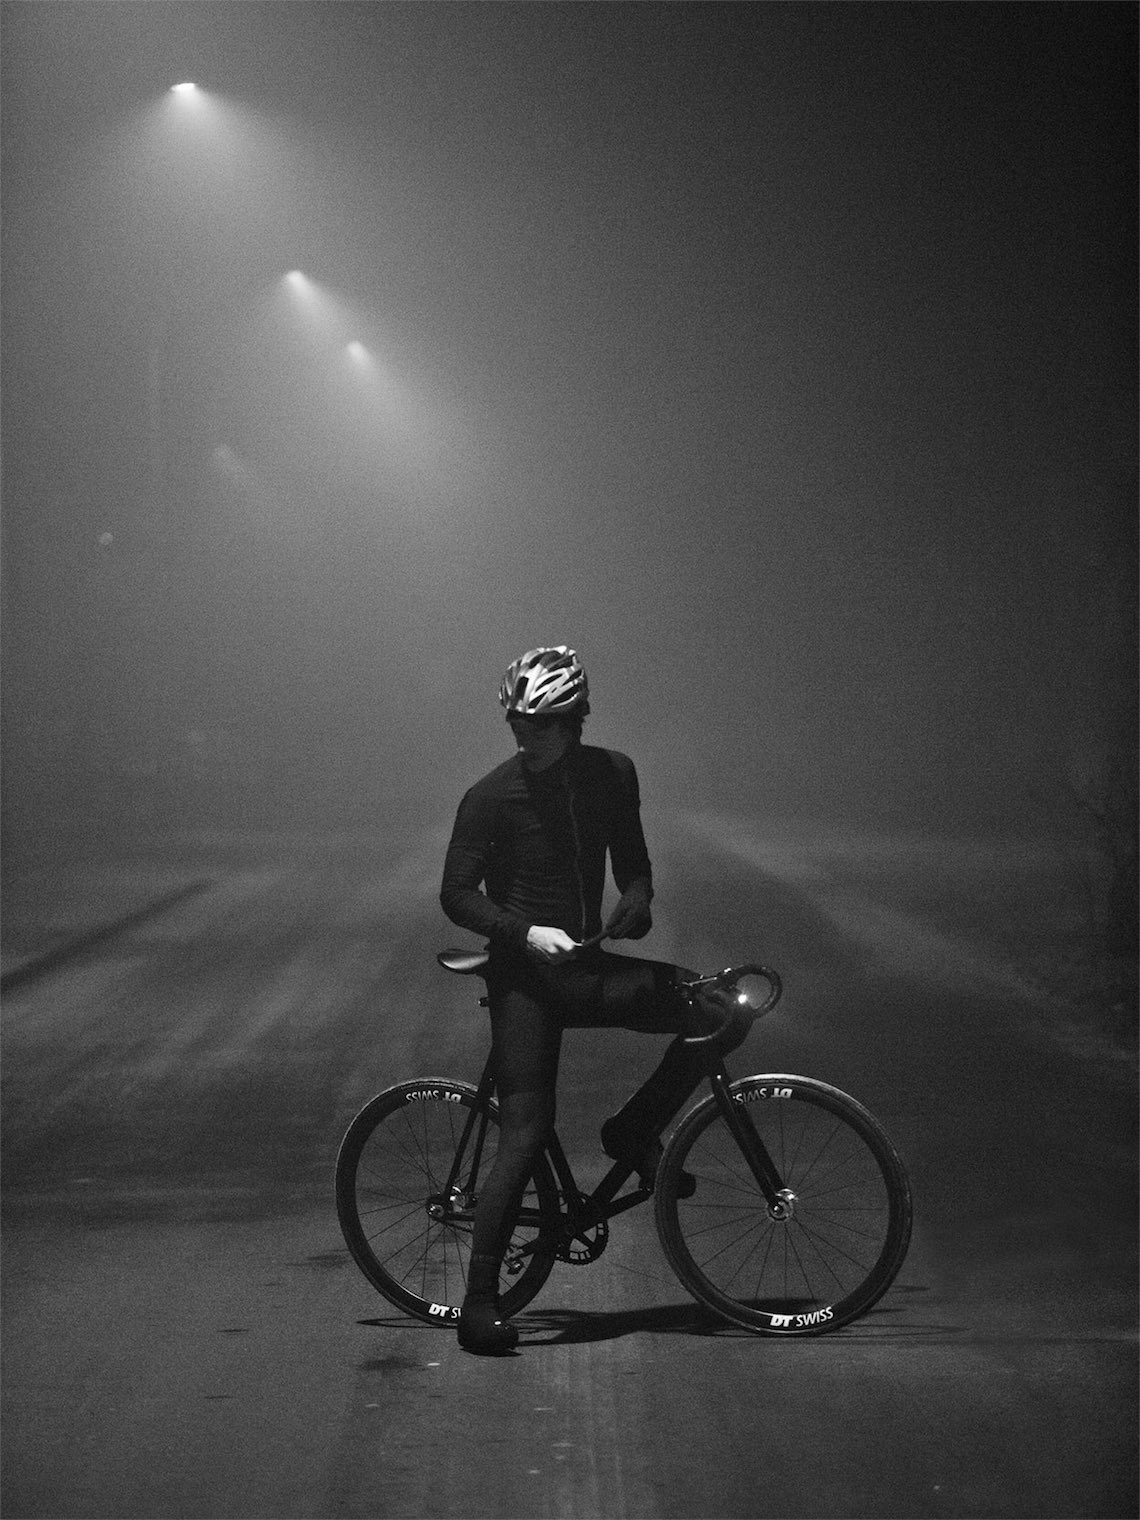 Janosch Abel Socialpictures_Ghost_Town_7